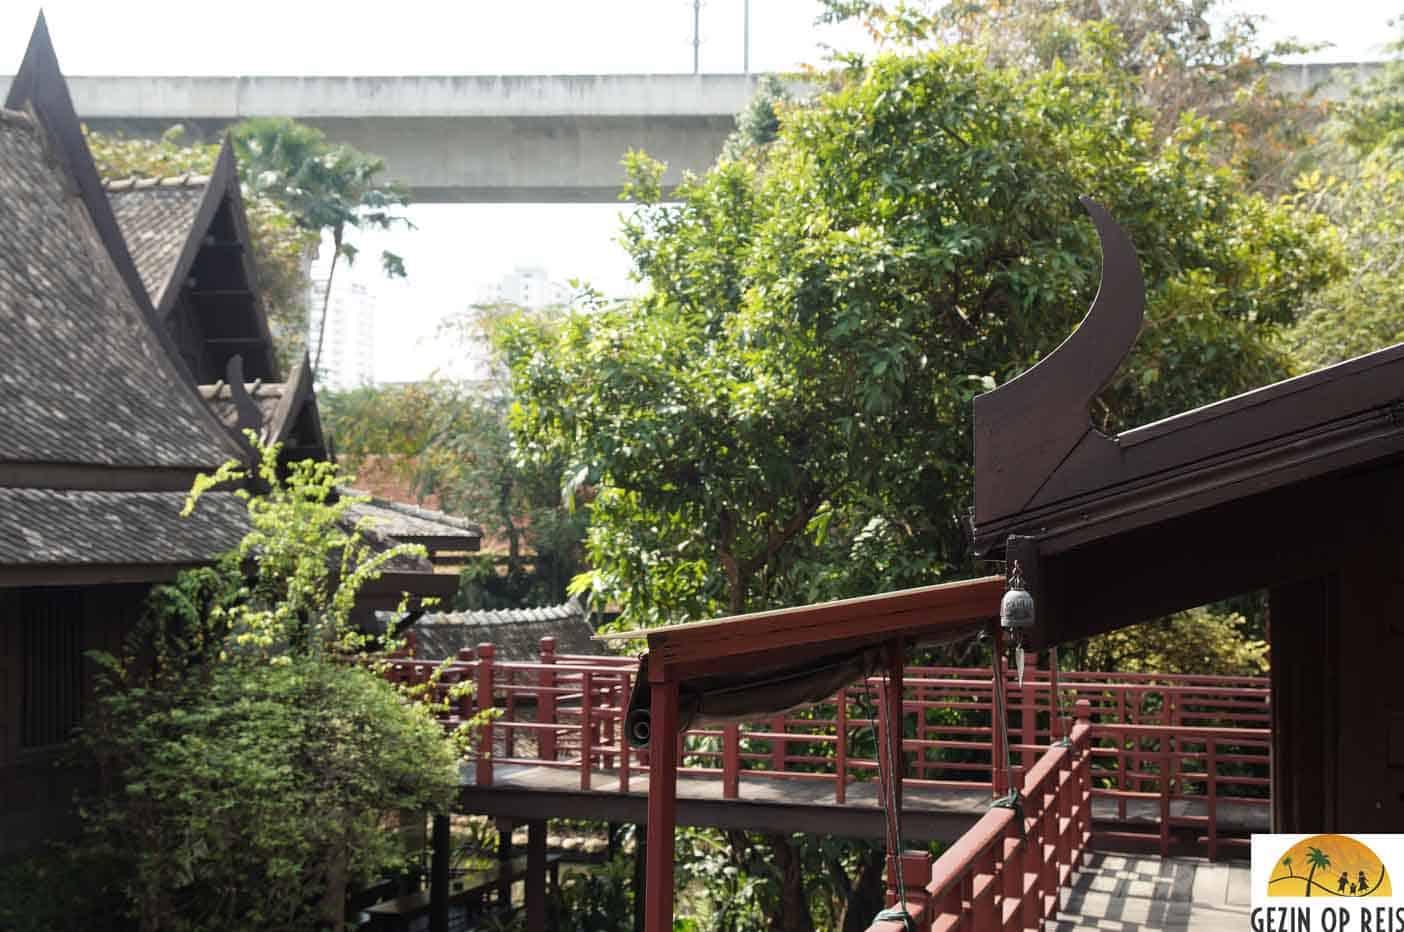 Suan pakkad paleis bangkok thailand